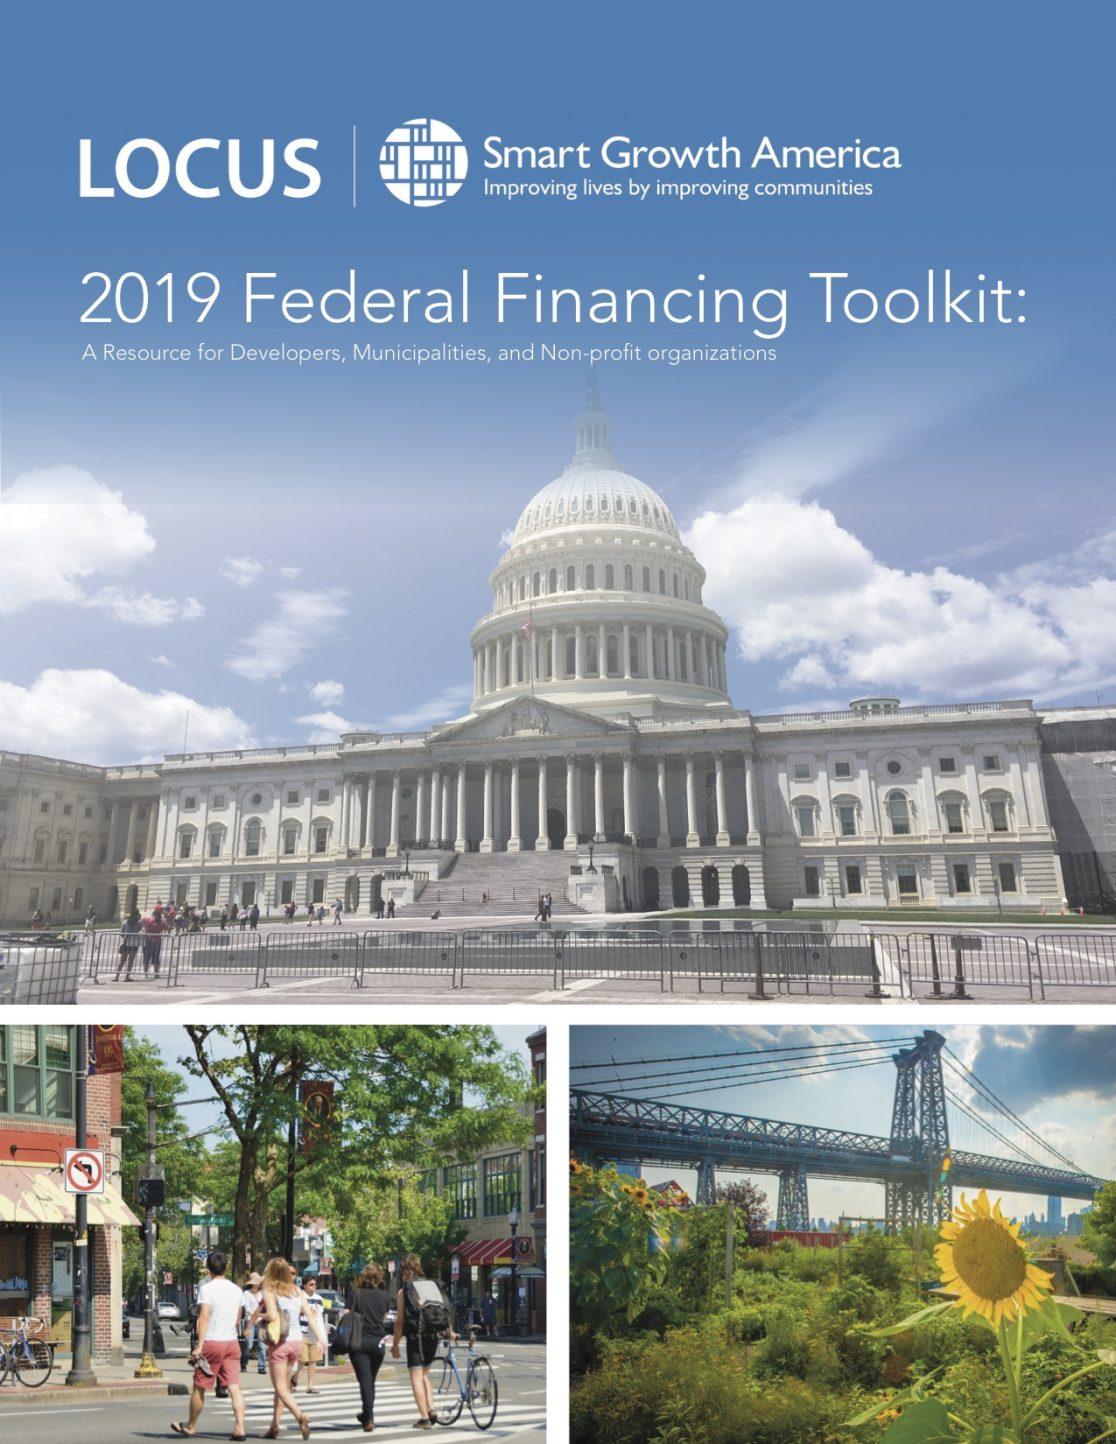 2019 Federal Financing Toolkit